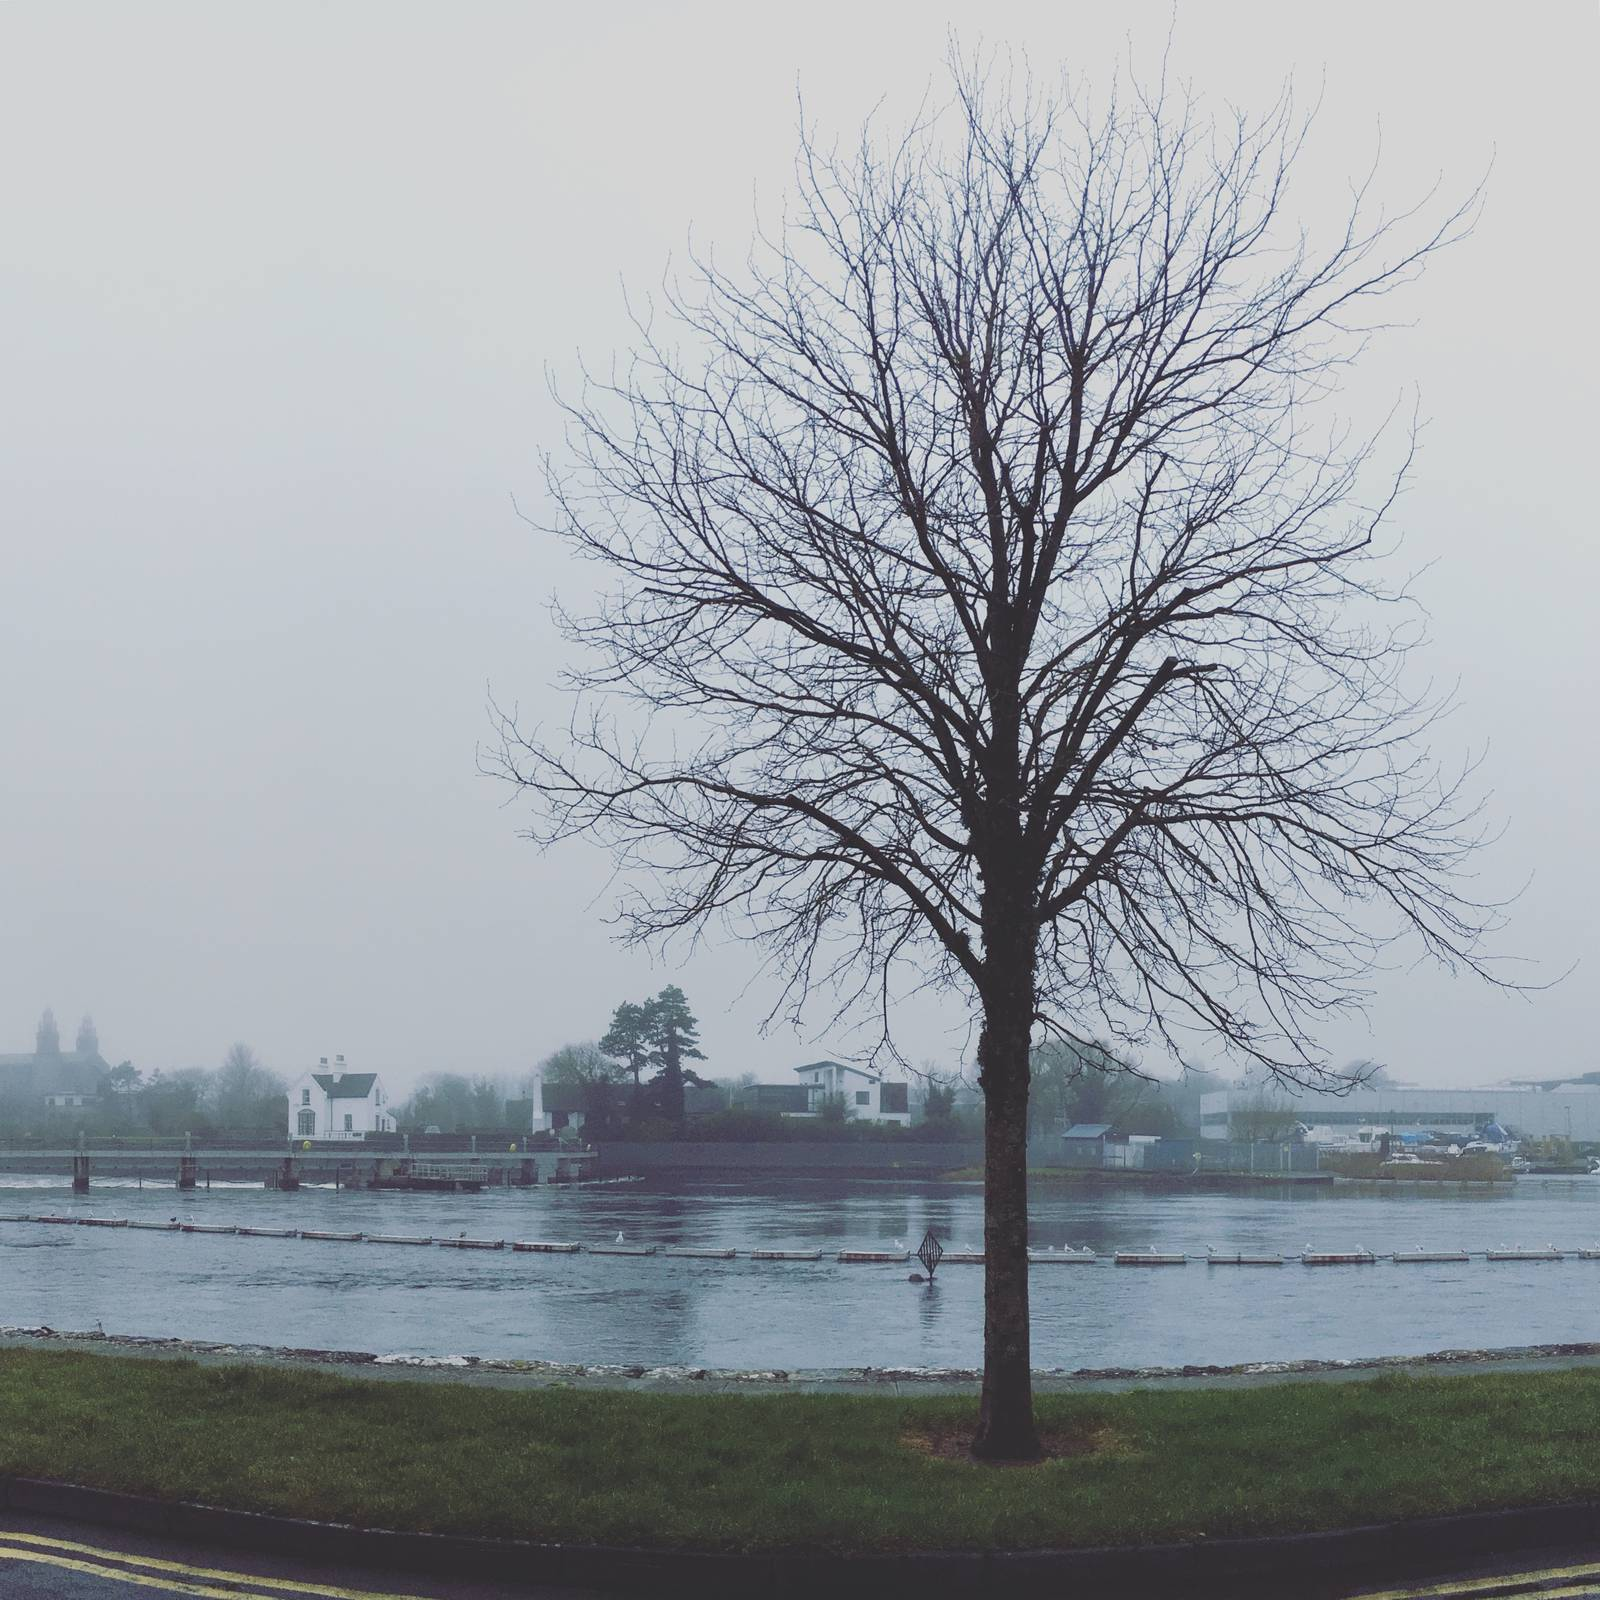 Misty night at Waterside